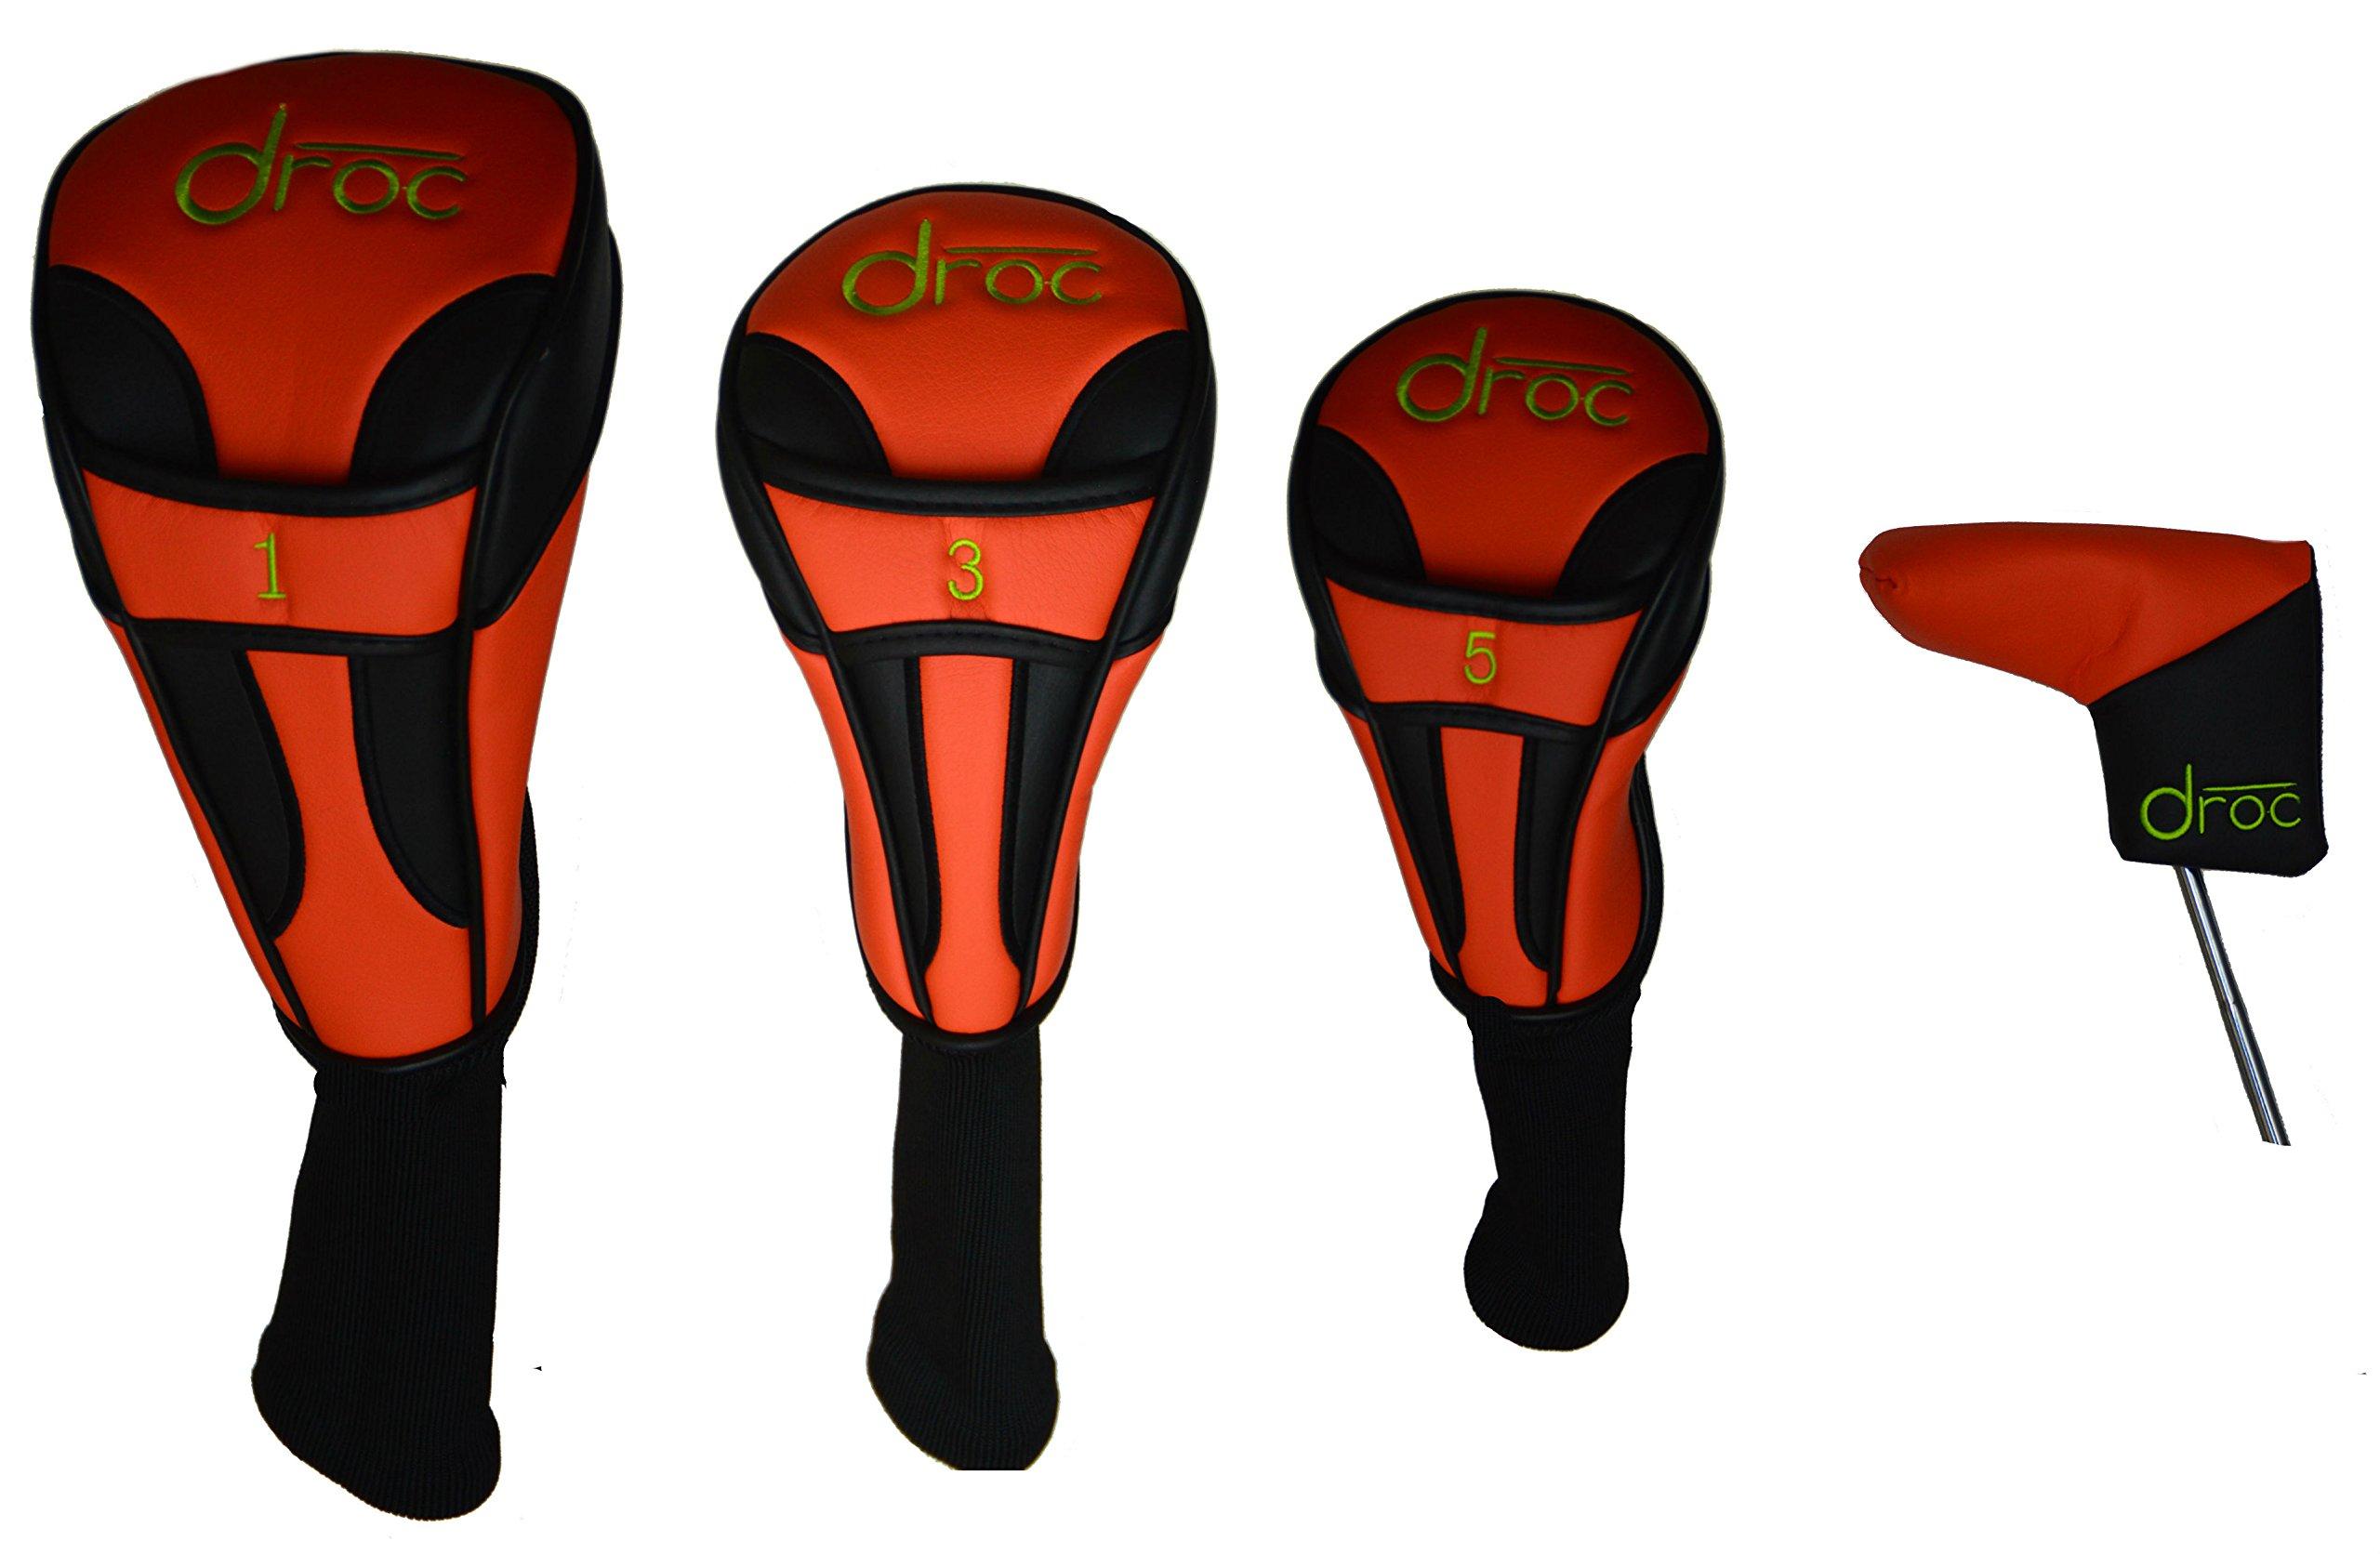 droc - Mica Left Handed Series 7 Pieces Golf Club Set & Golf Bag Ages 3-6 Left Handed (Titanium, Regular) by droc (Image #9)